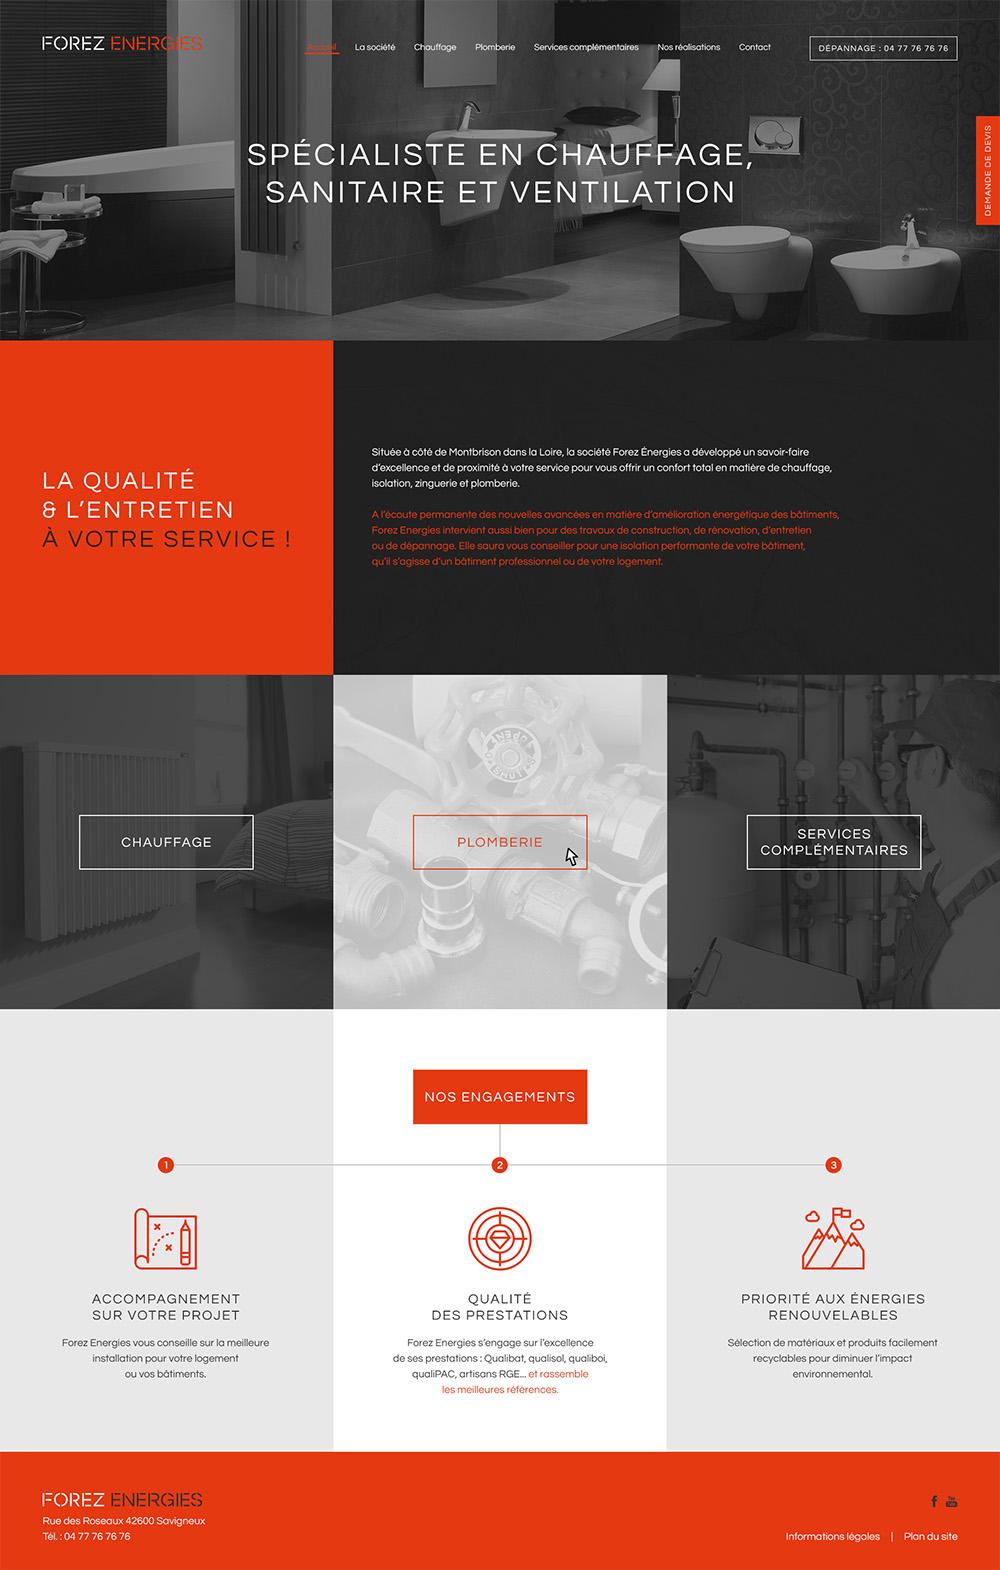 byedel_webdesign_actioncom_forez_energies